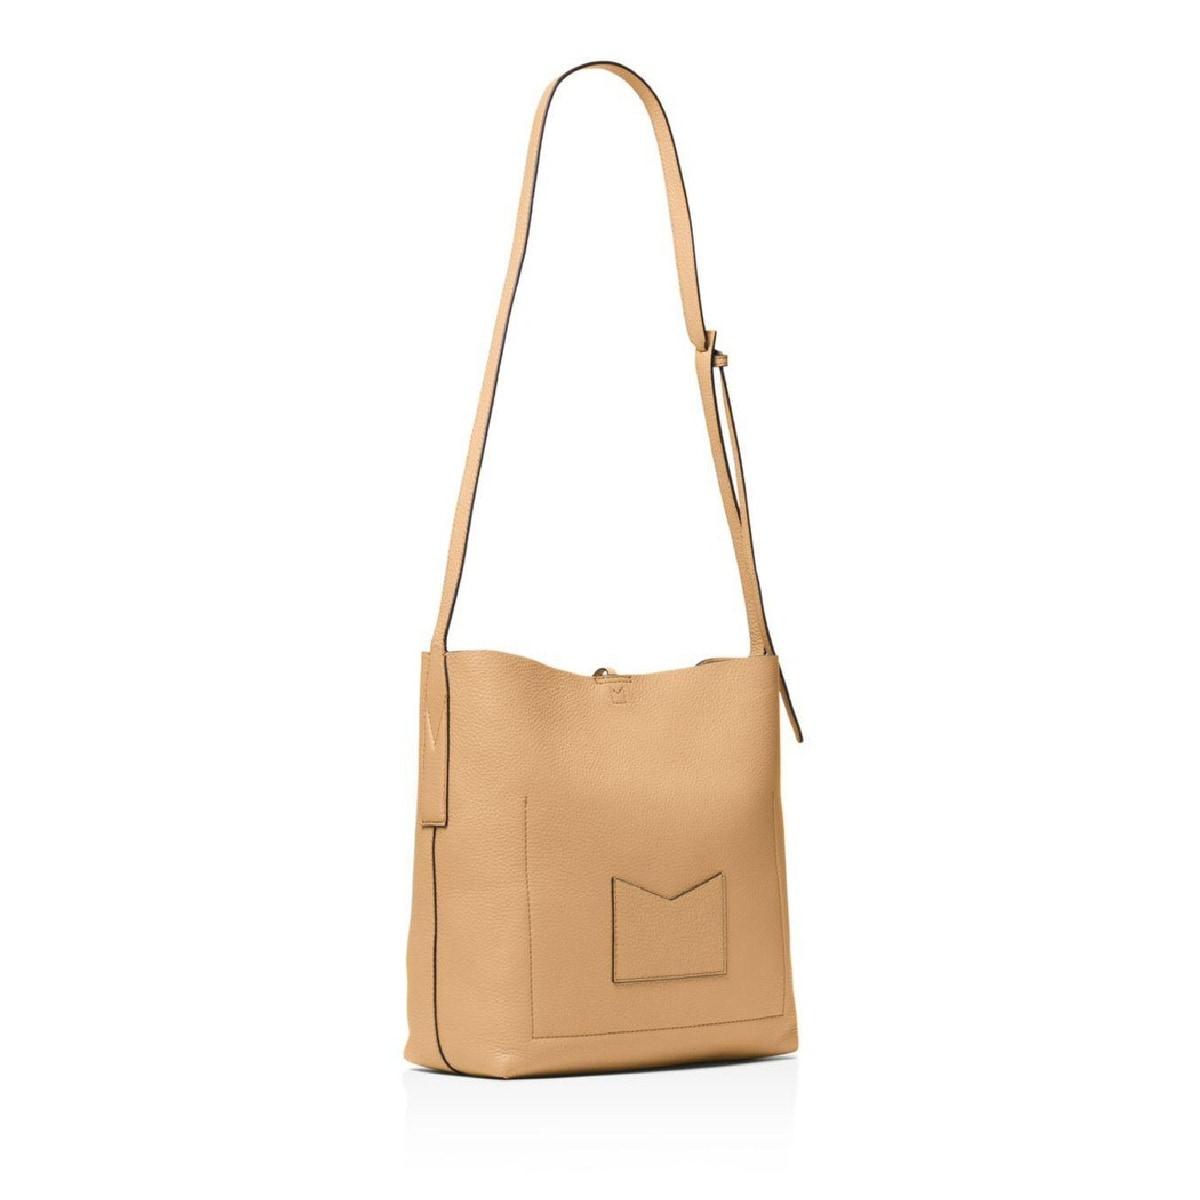 bb2e52e00c11 Shop MICHAEL Michael Kors Junie Large Pebble Leather Messenger Bag Butternut  - Free Shipping Today - Overstock - 28040712